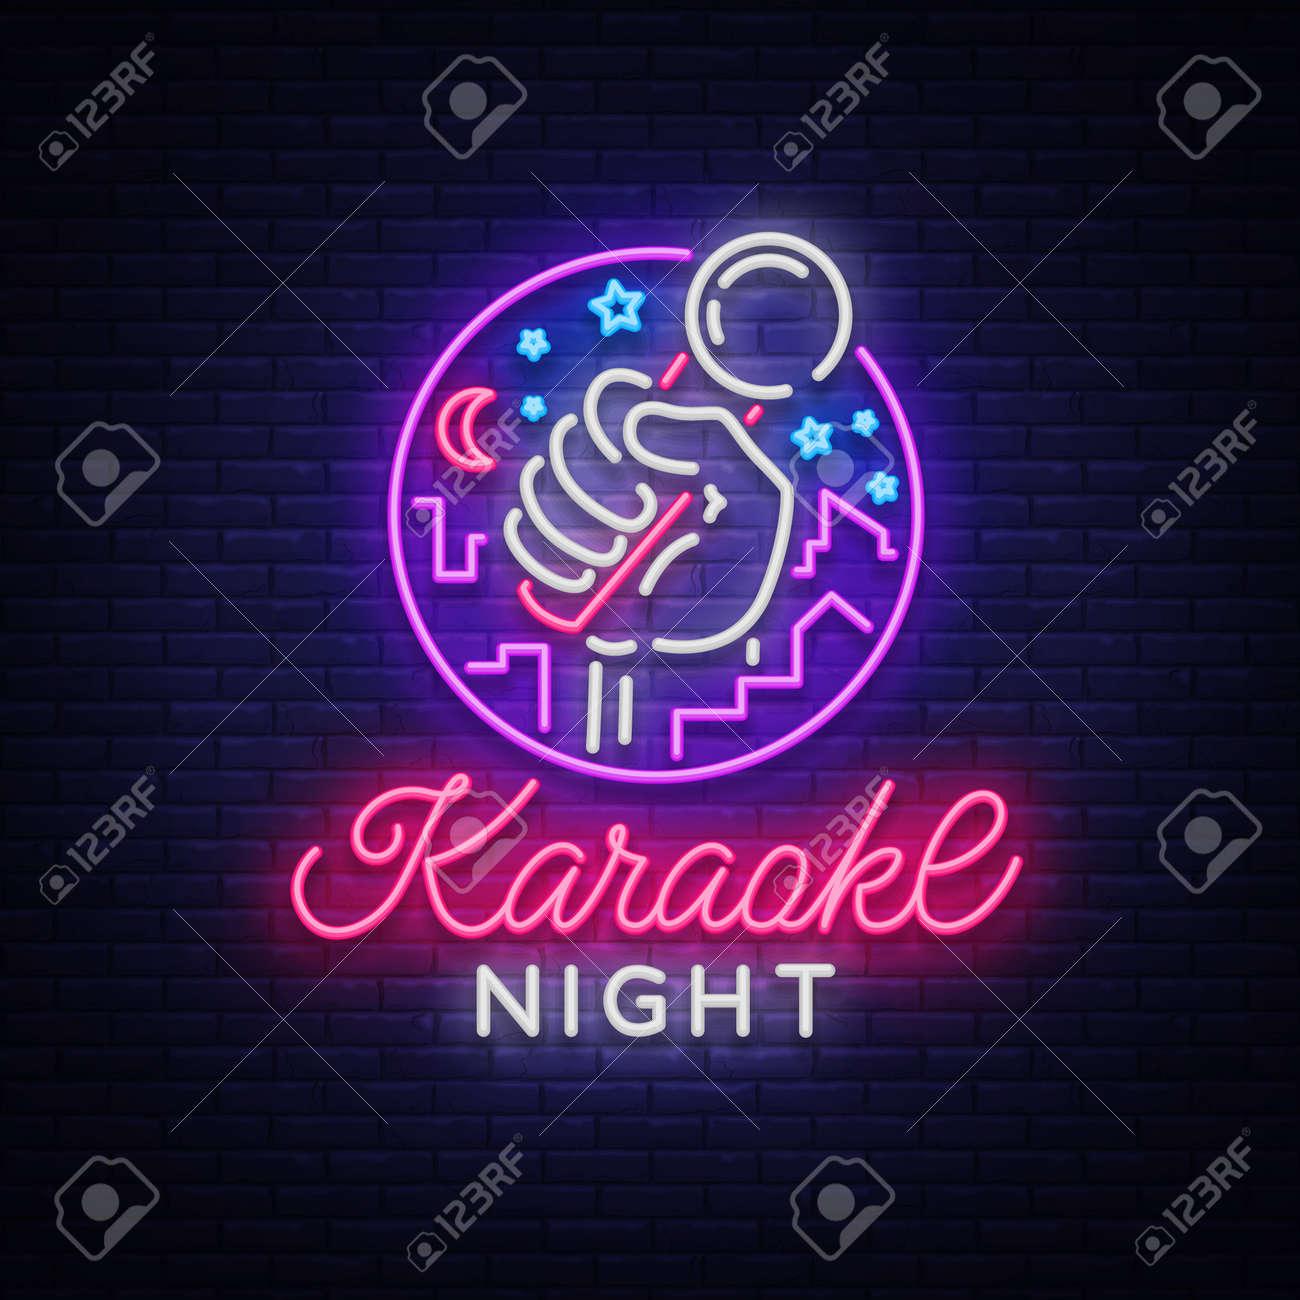 Karaoke night vector. - 96070868